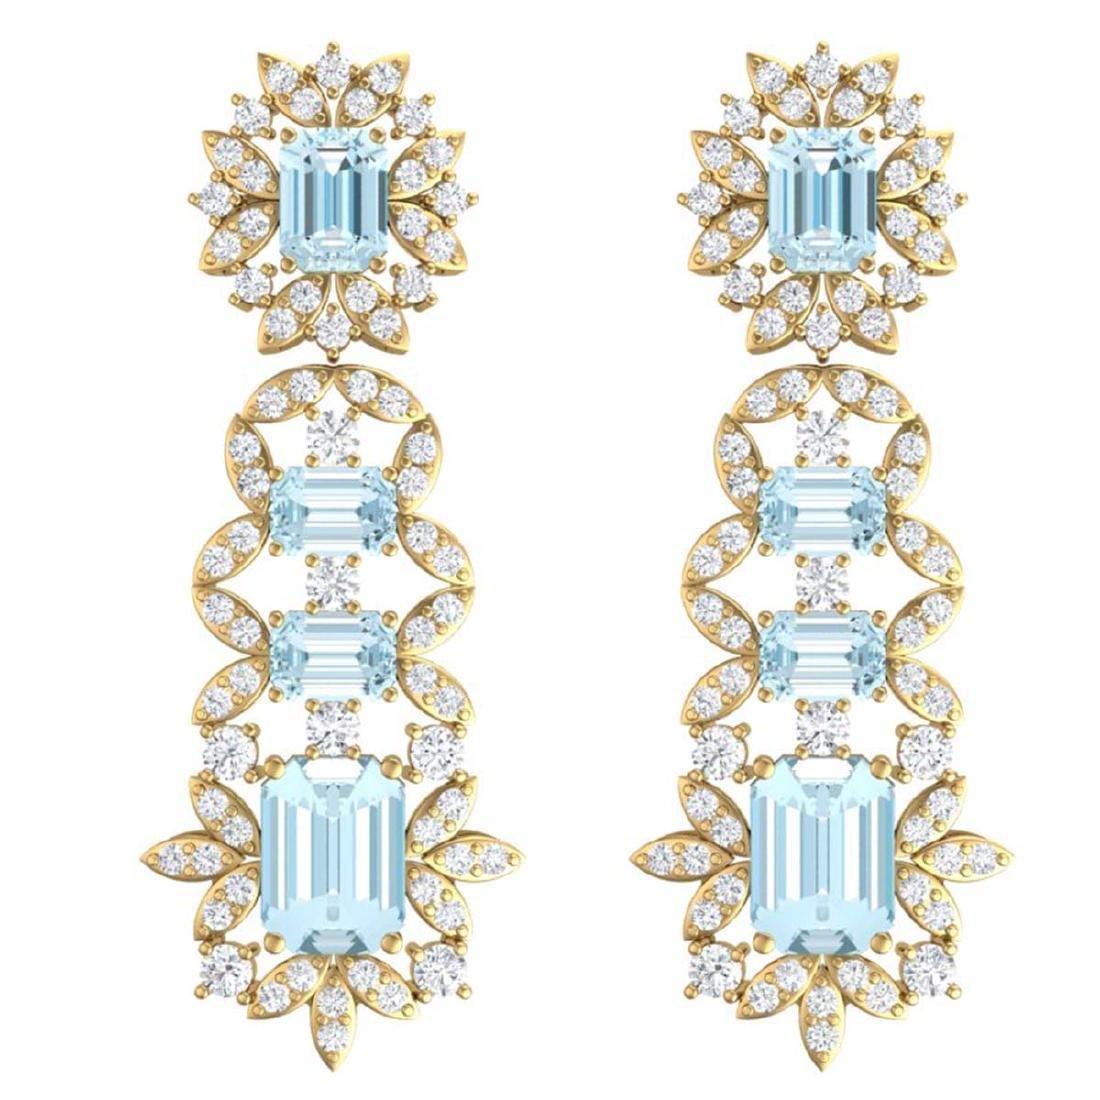 33.36 ctw Sky Topaz & VS Diamond Earrings 18K Yellow